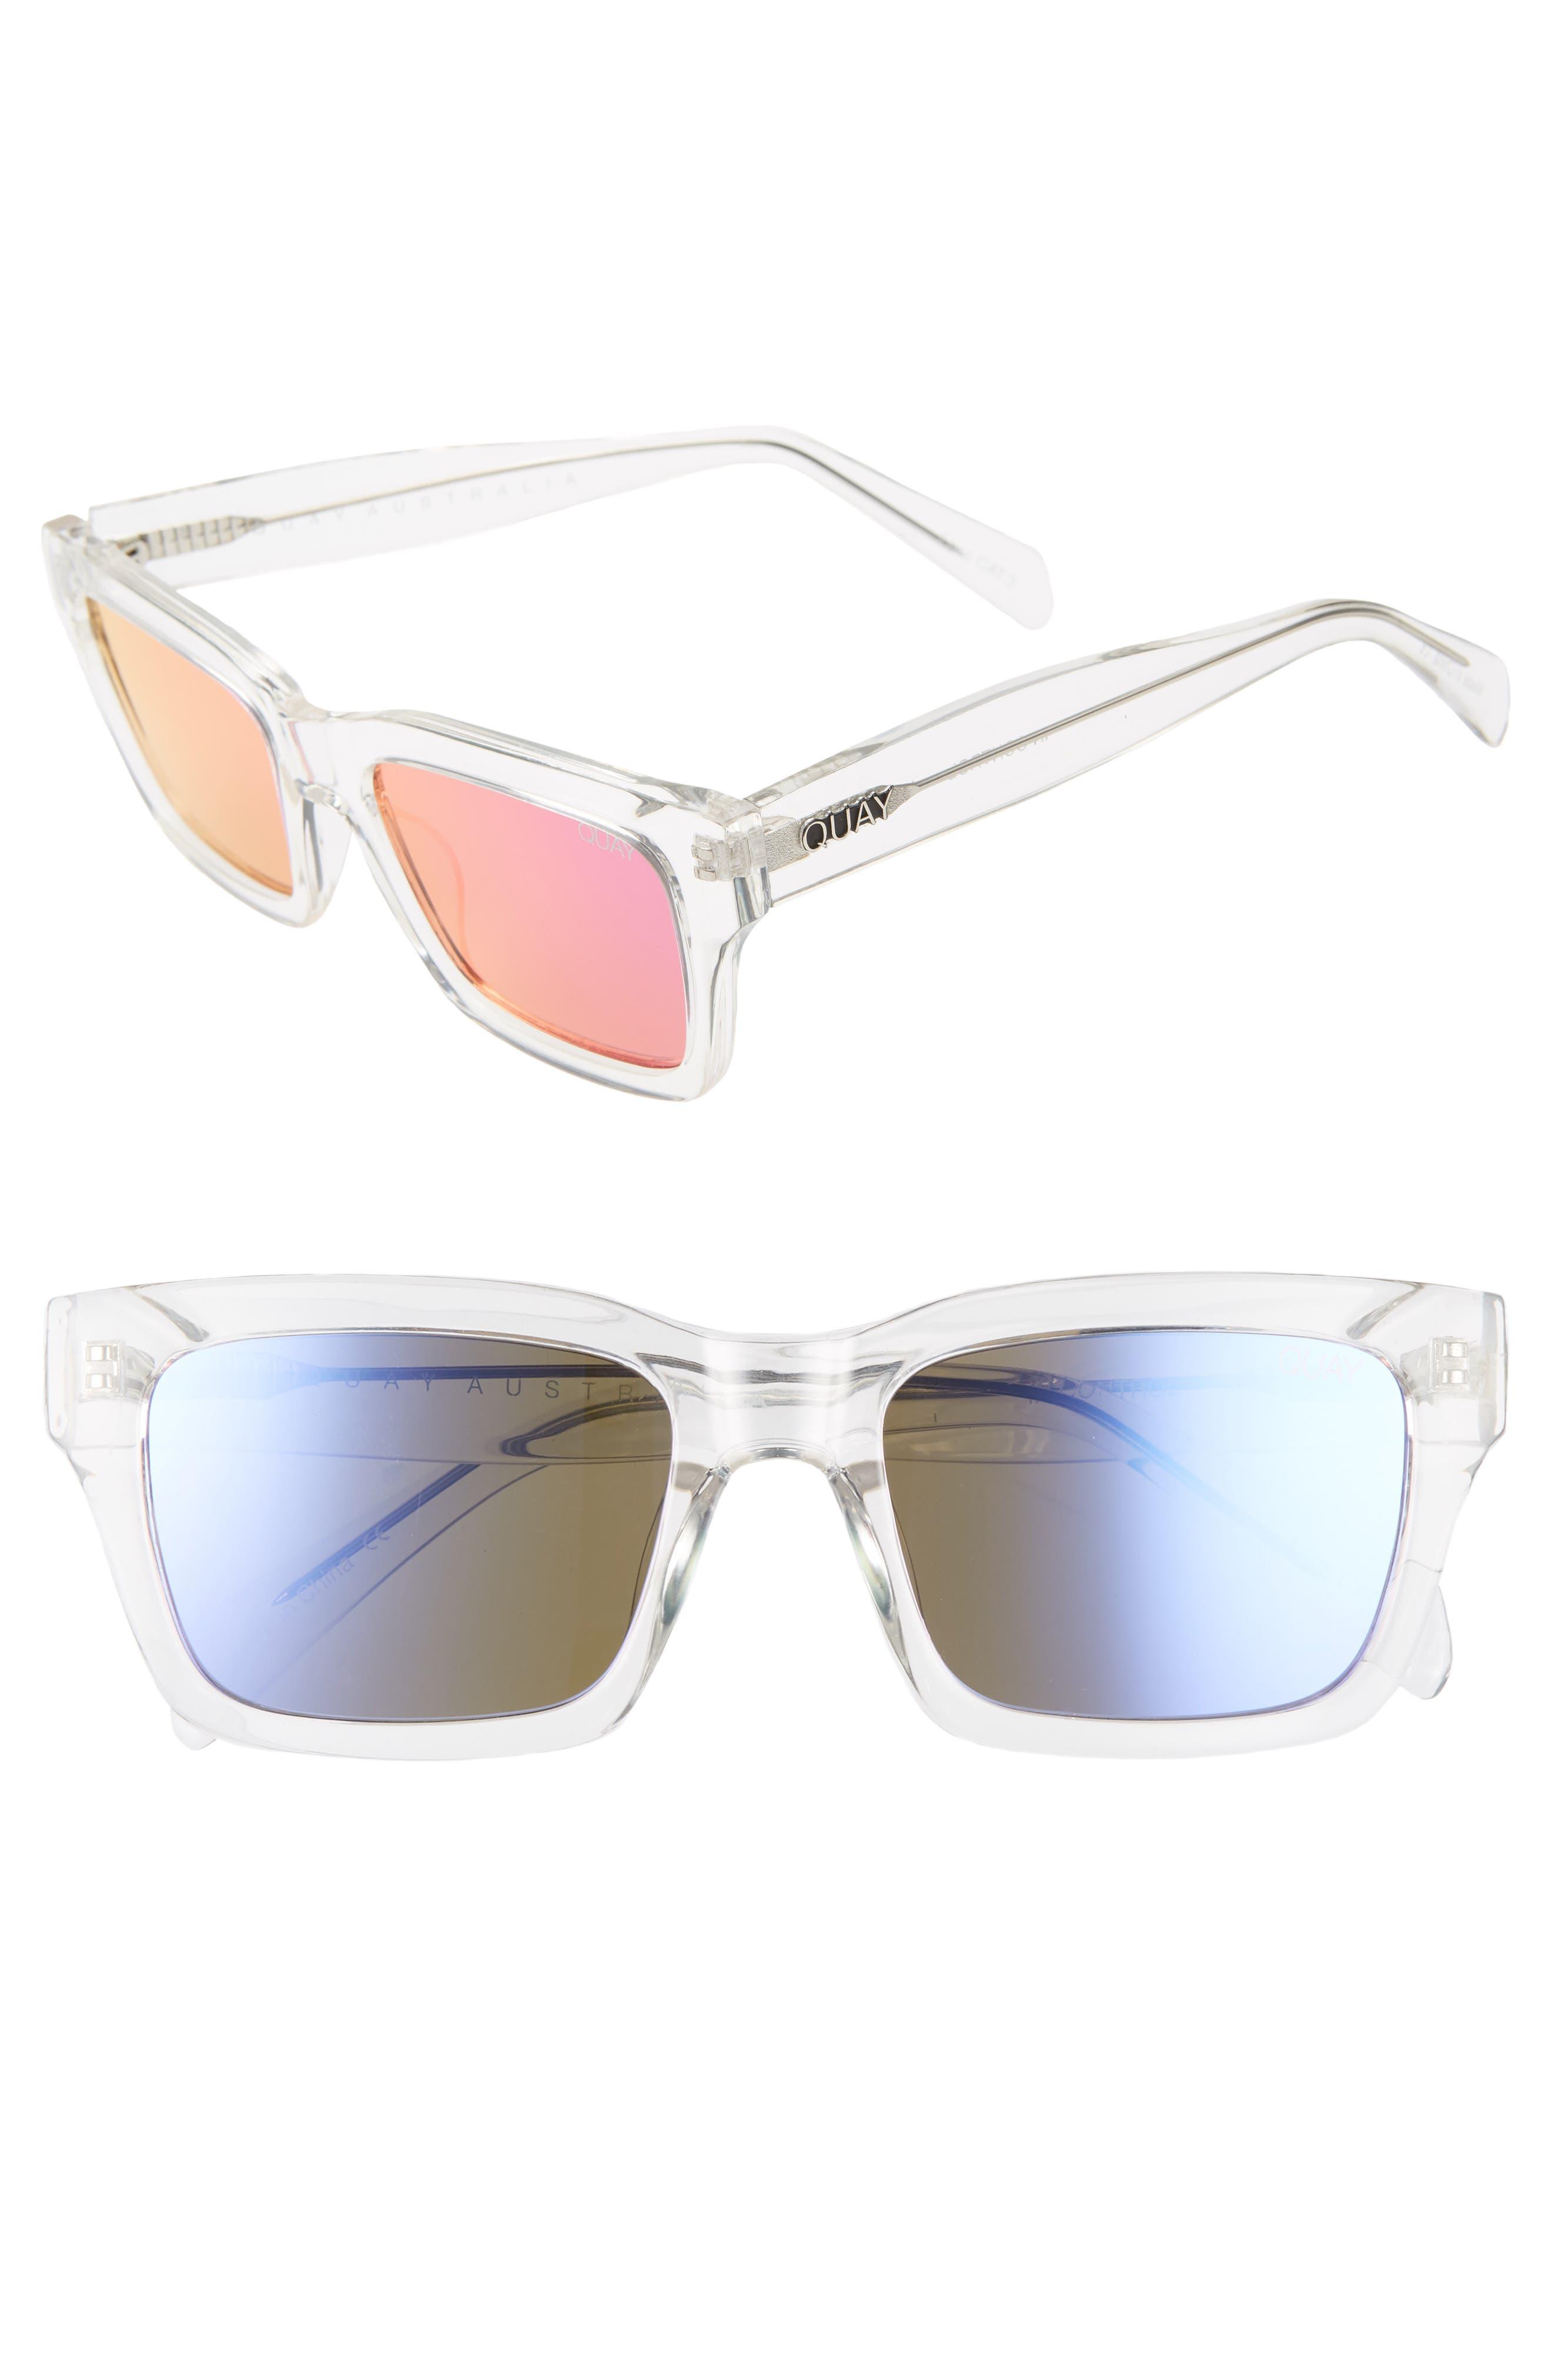 Quay Australia In Control 4m Rectangle Sunglasses - Clear/ Purple Pink